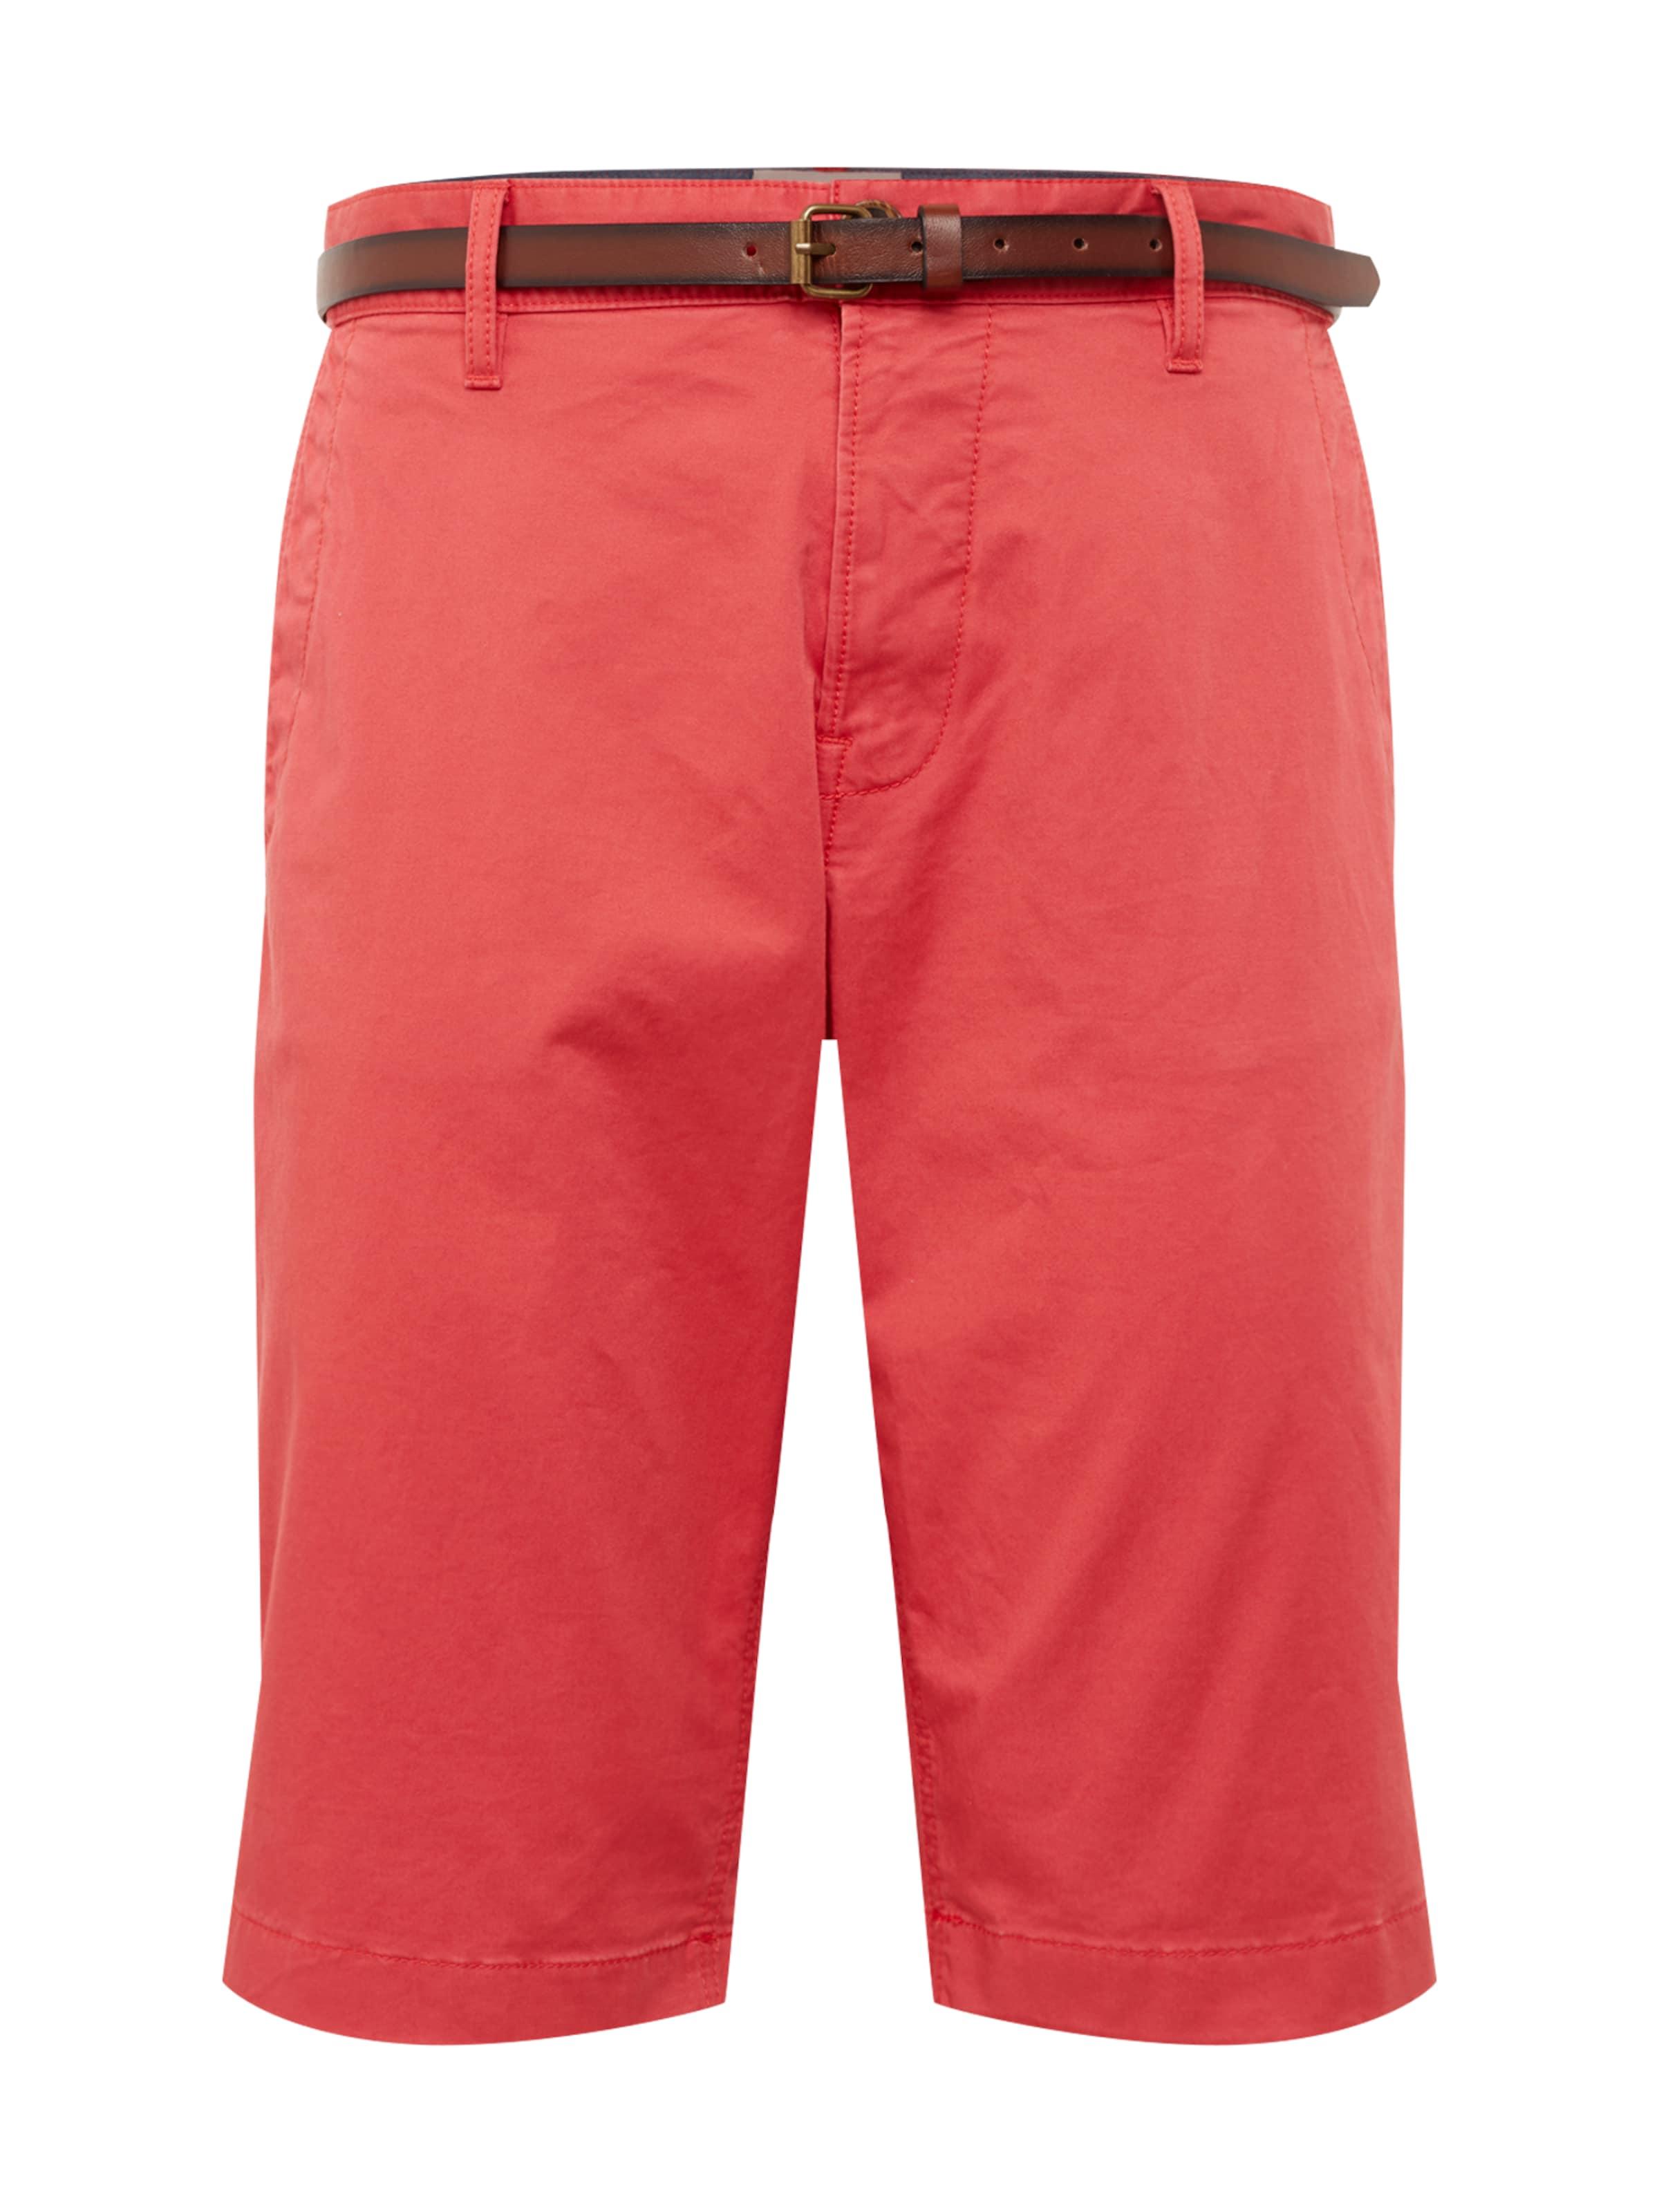 Pantalon Tailor Marine Bleu Tom En HI29YWDE